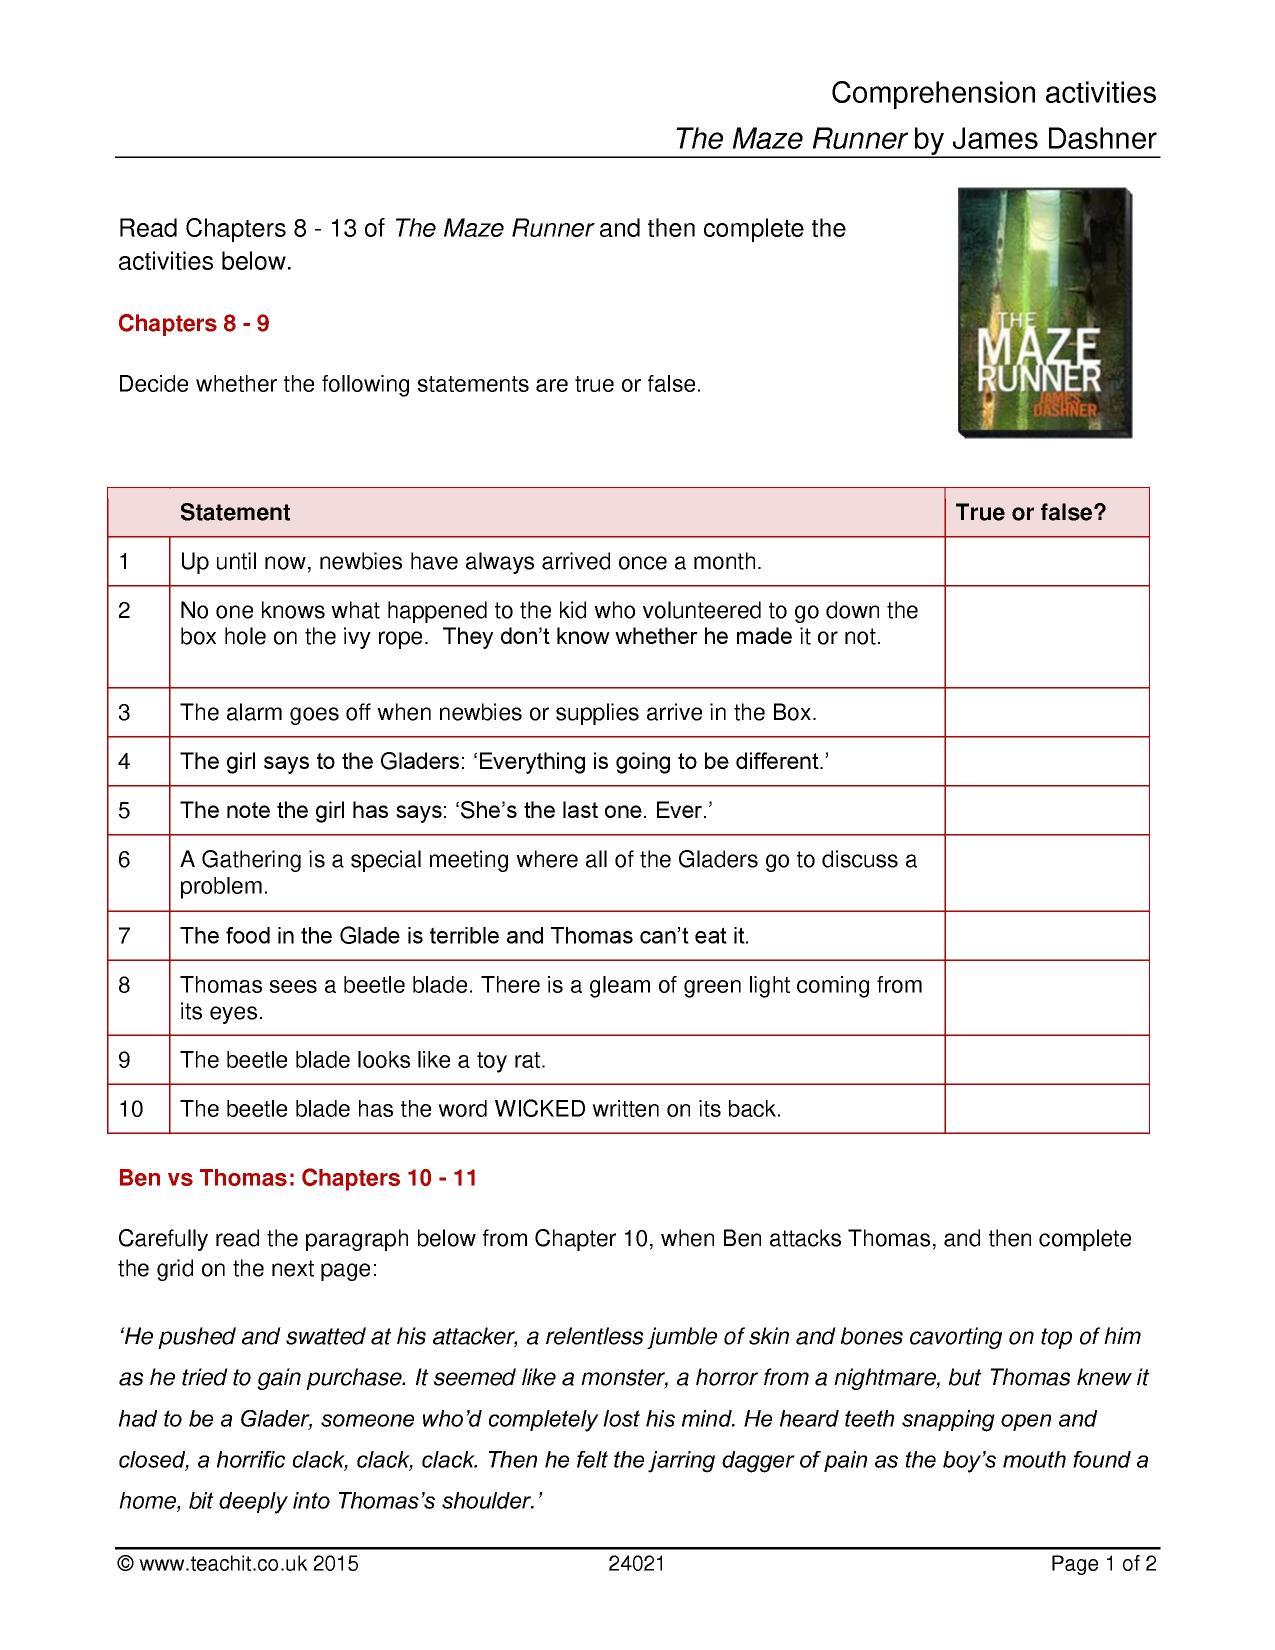 - Ks3 English Worksheet Comprehension Printable Worksheets And